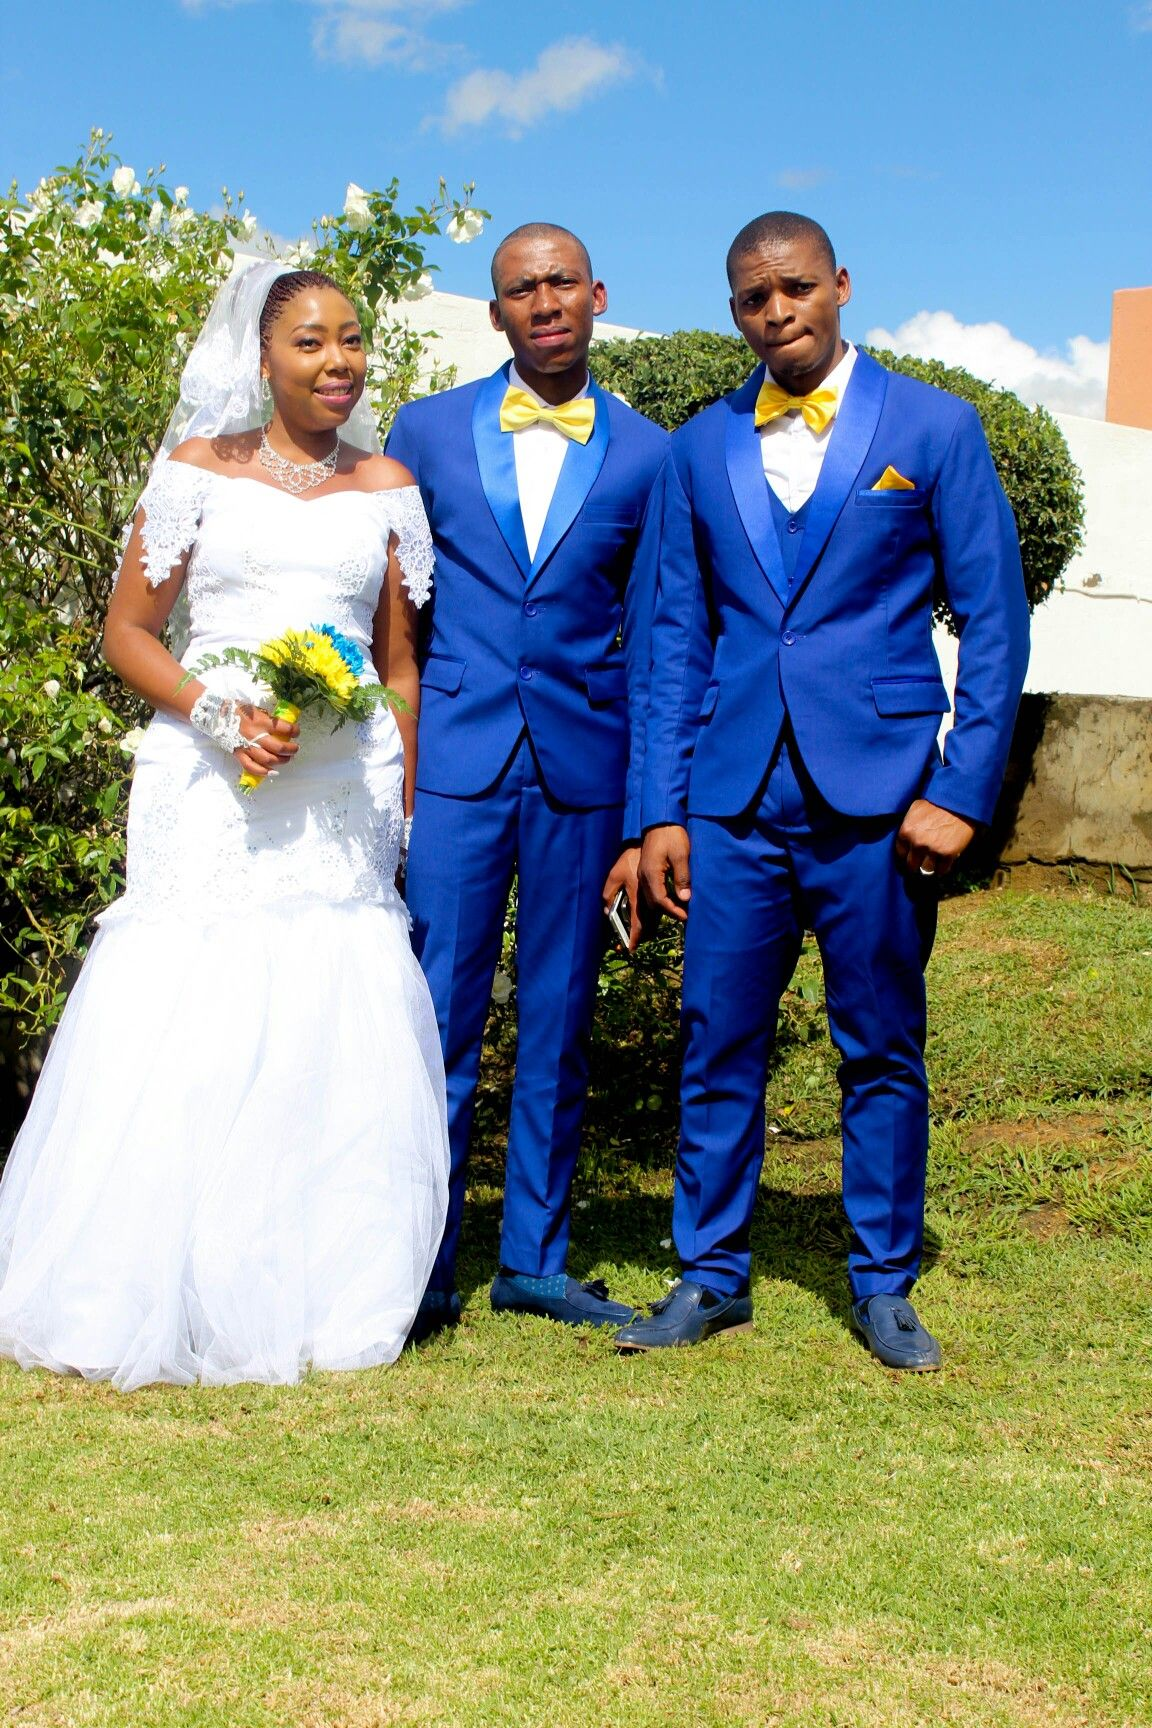 Royal Blue And Yellow Wedding Theme Royal Blue Suit Wedding Royal Blue Wedding Blue Tuxedo Wedding [ 1728 x 1152 Pixel ]